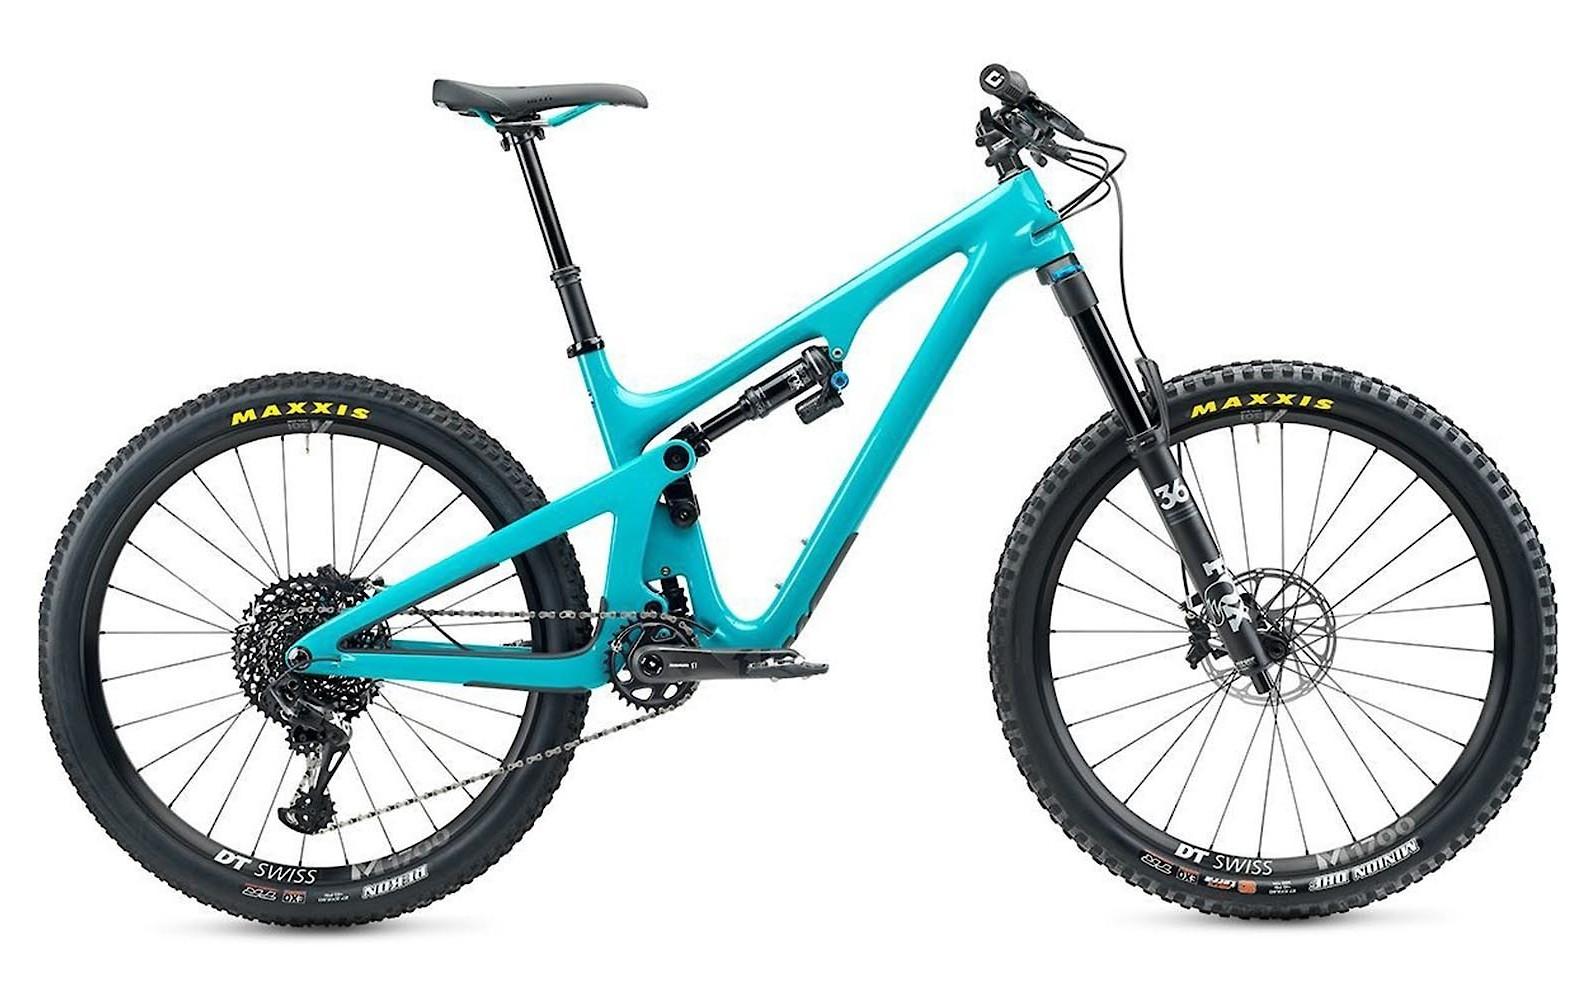 2020 Yeti SB140 C2 in turquoise